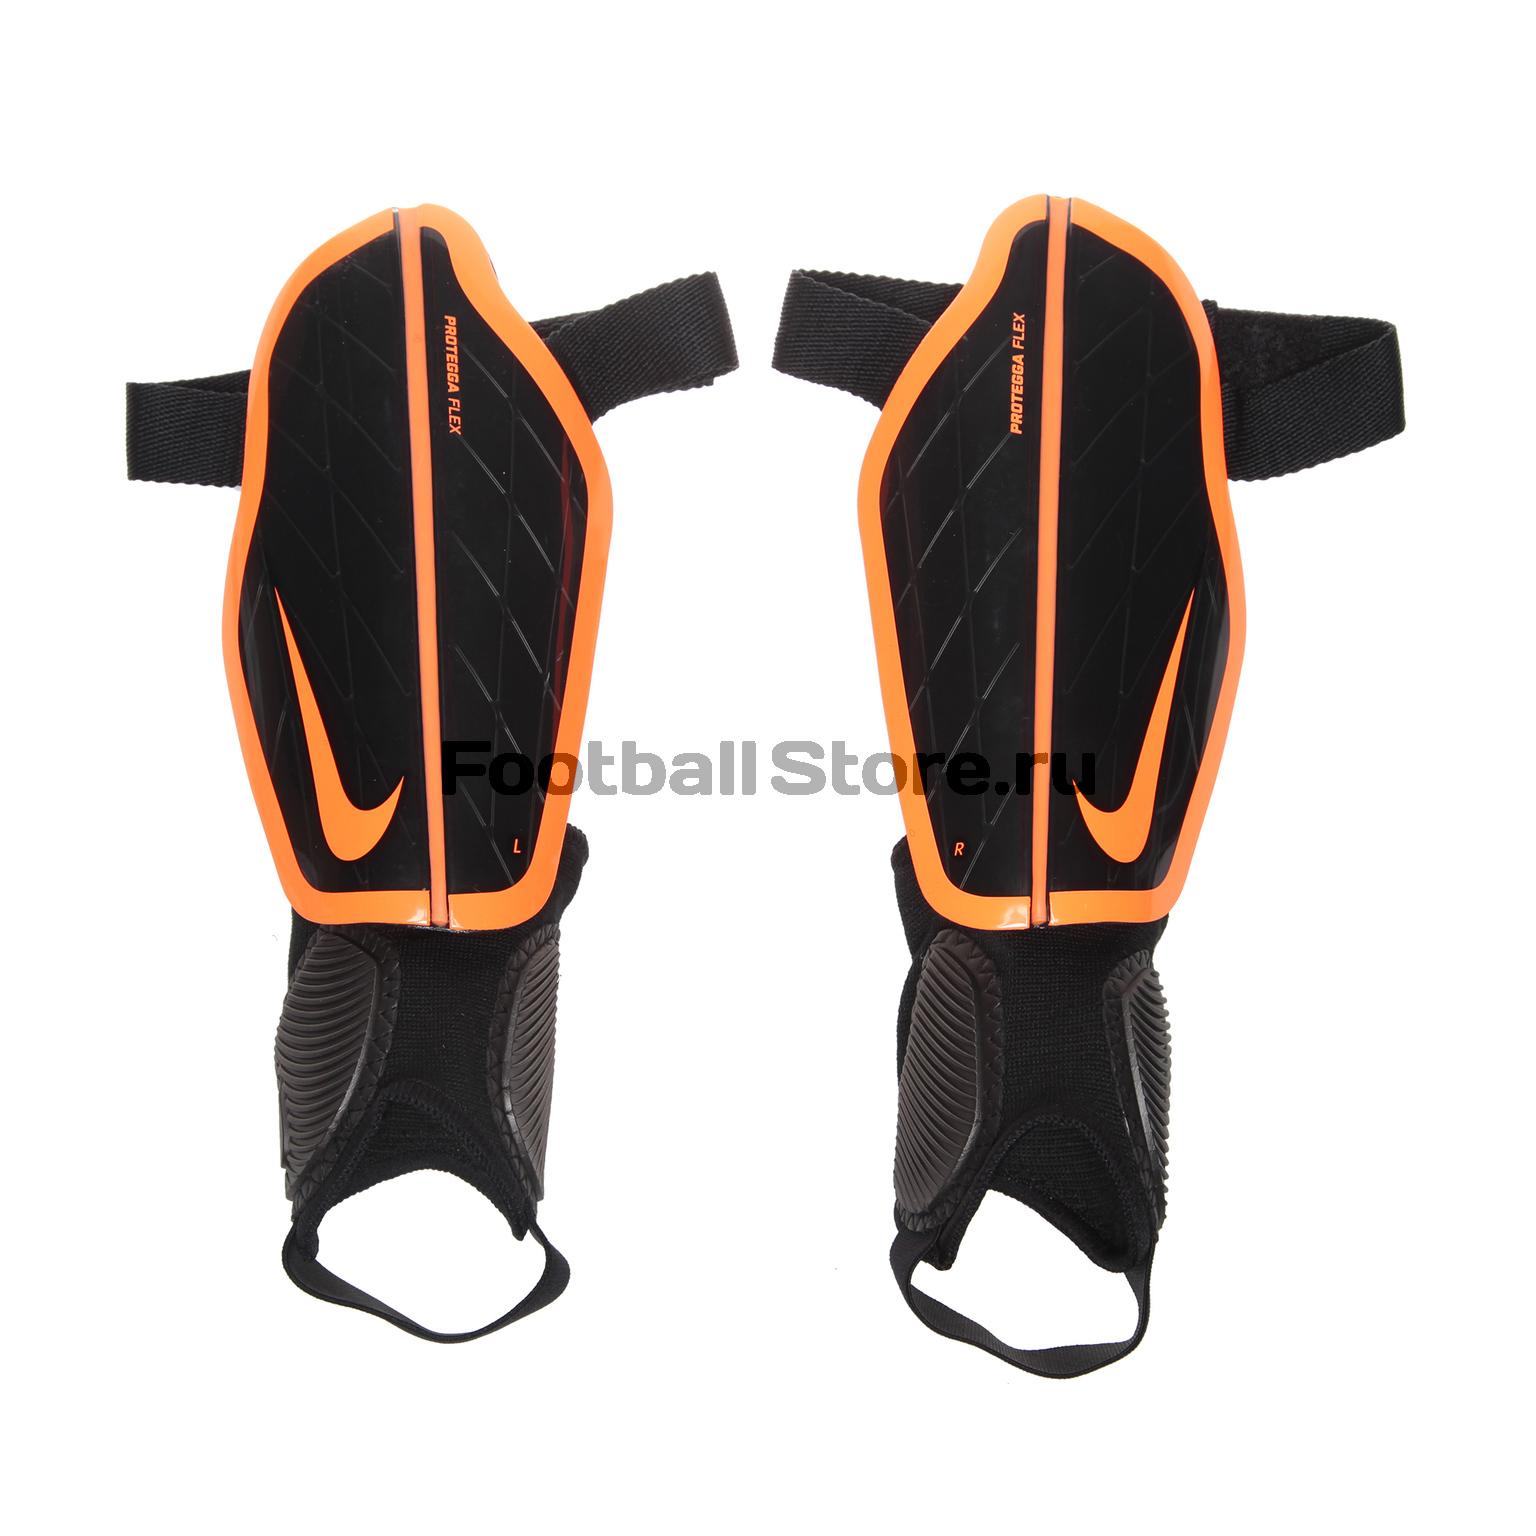 Защита ног Nike Щитки Nike Protegga Flex SP0313-013